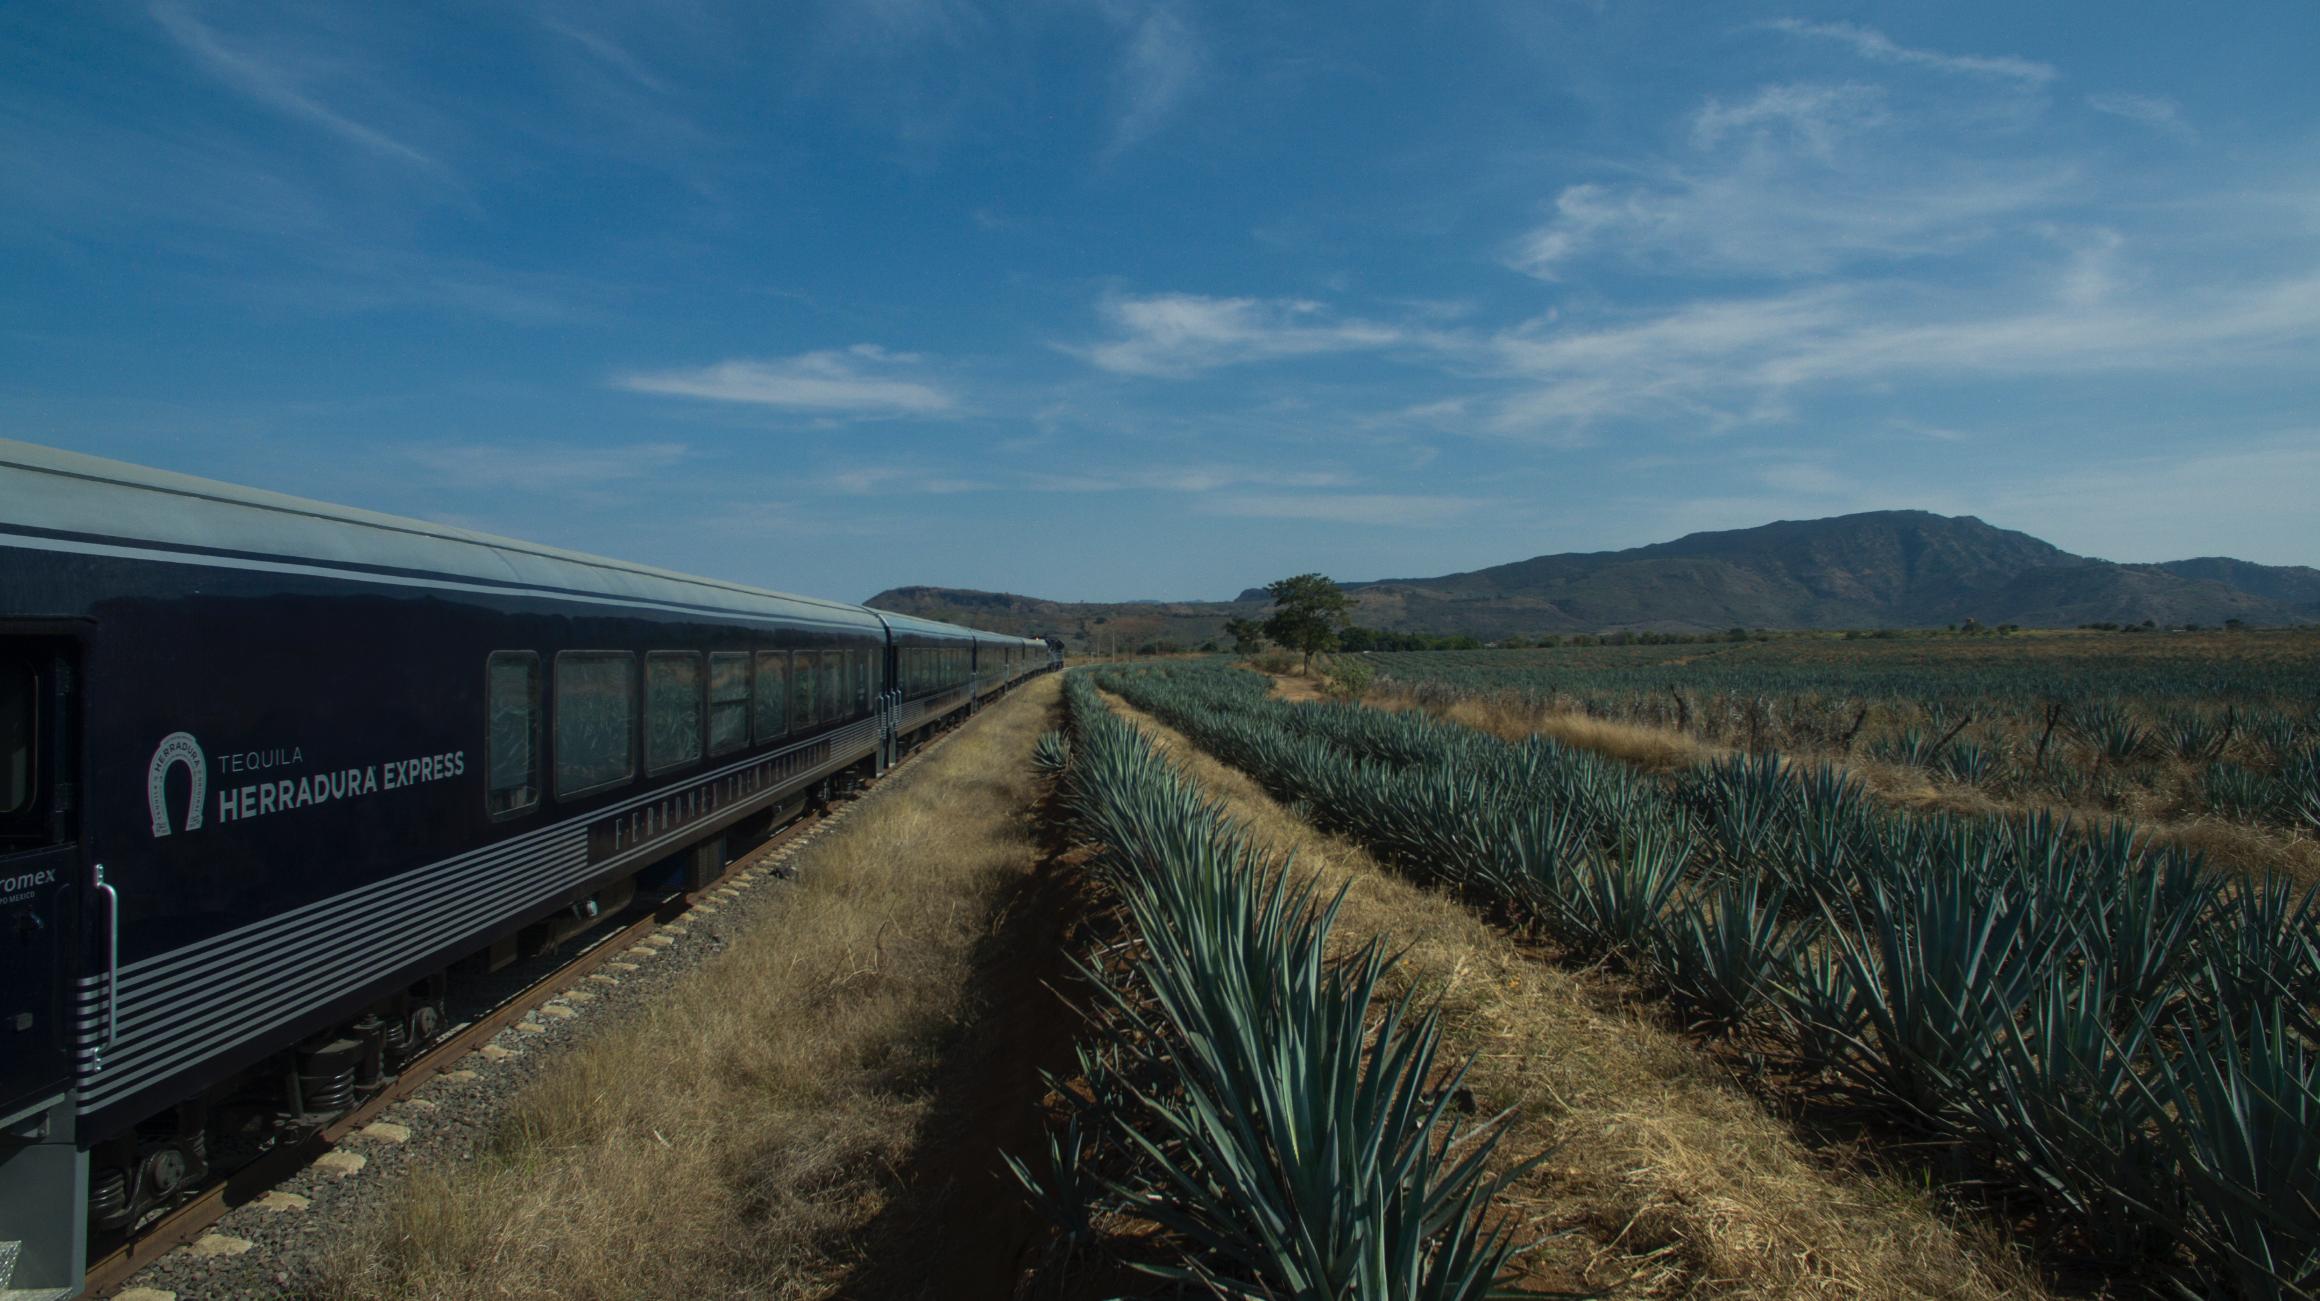 Guadalajara Tequila Mexico